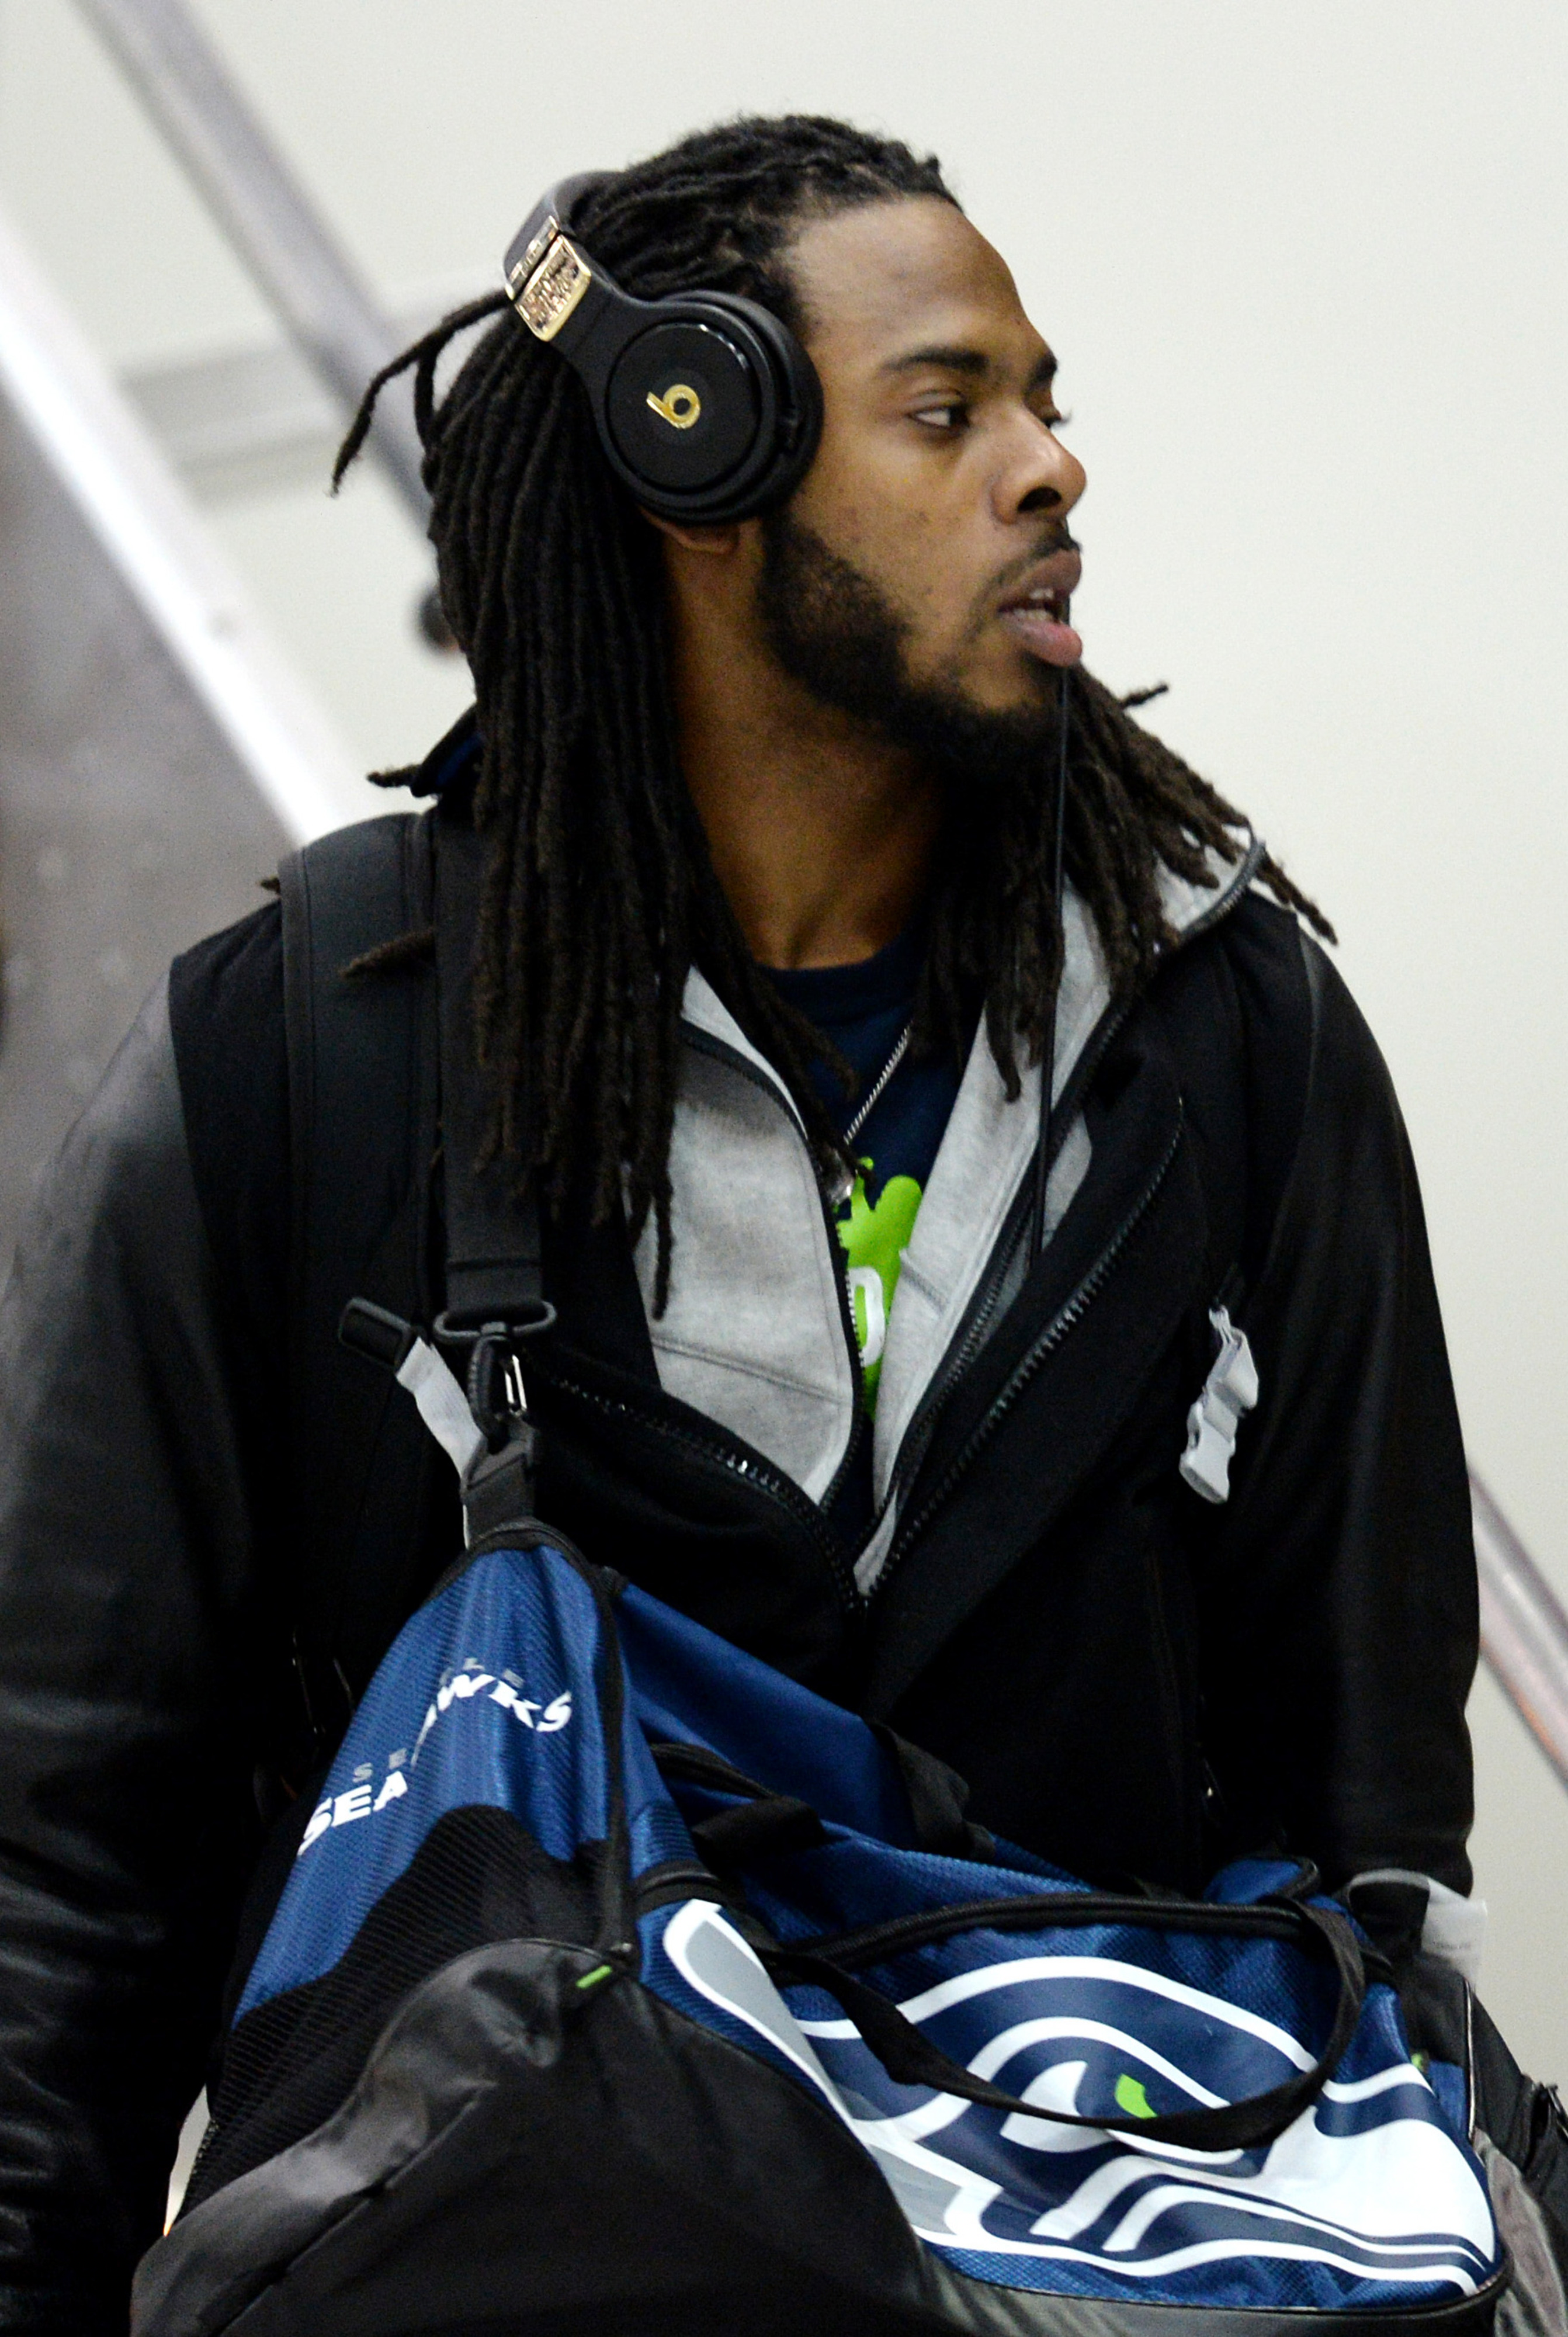 Richard Sherman presents Seahawks teammates with $25K headphones